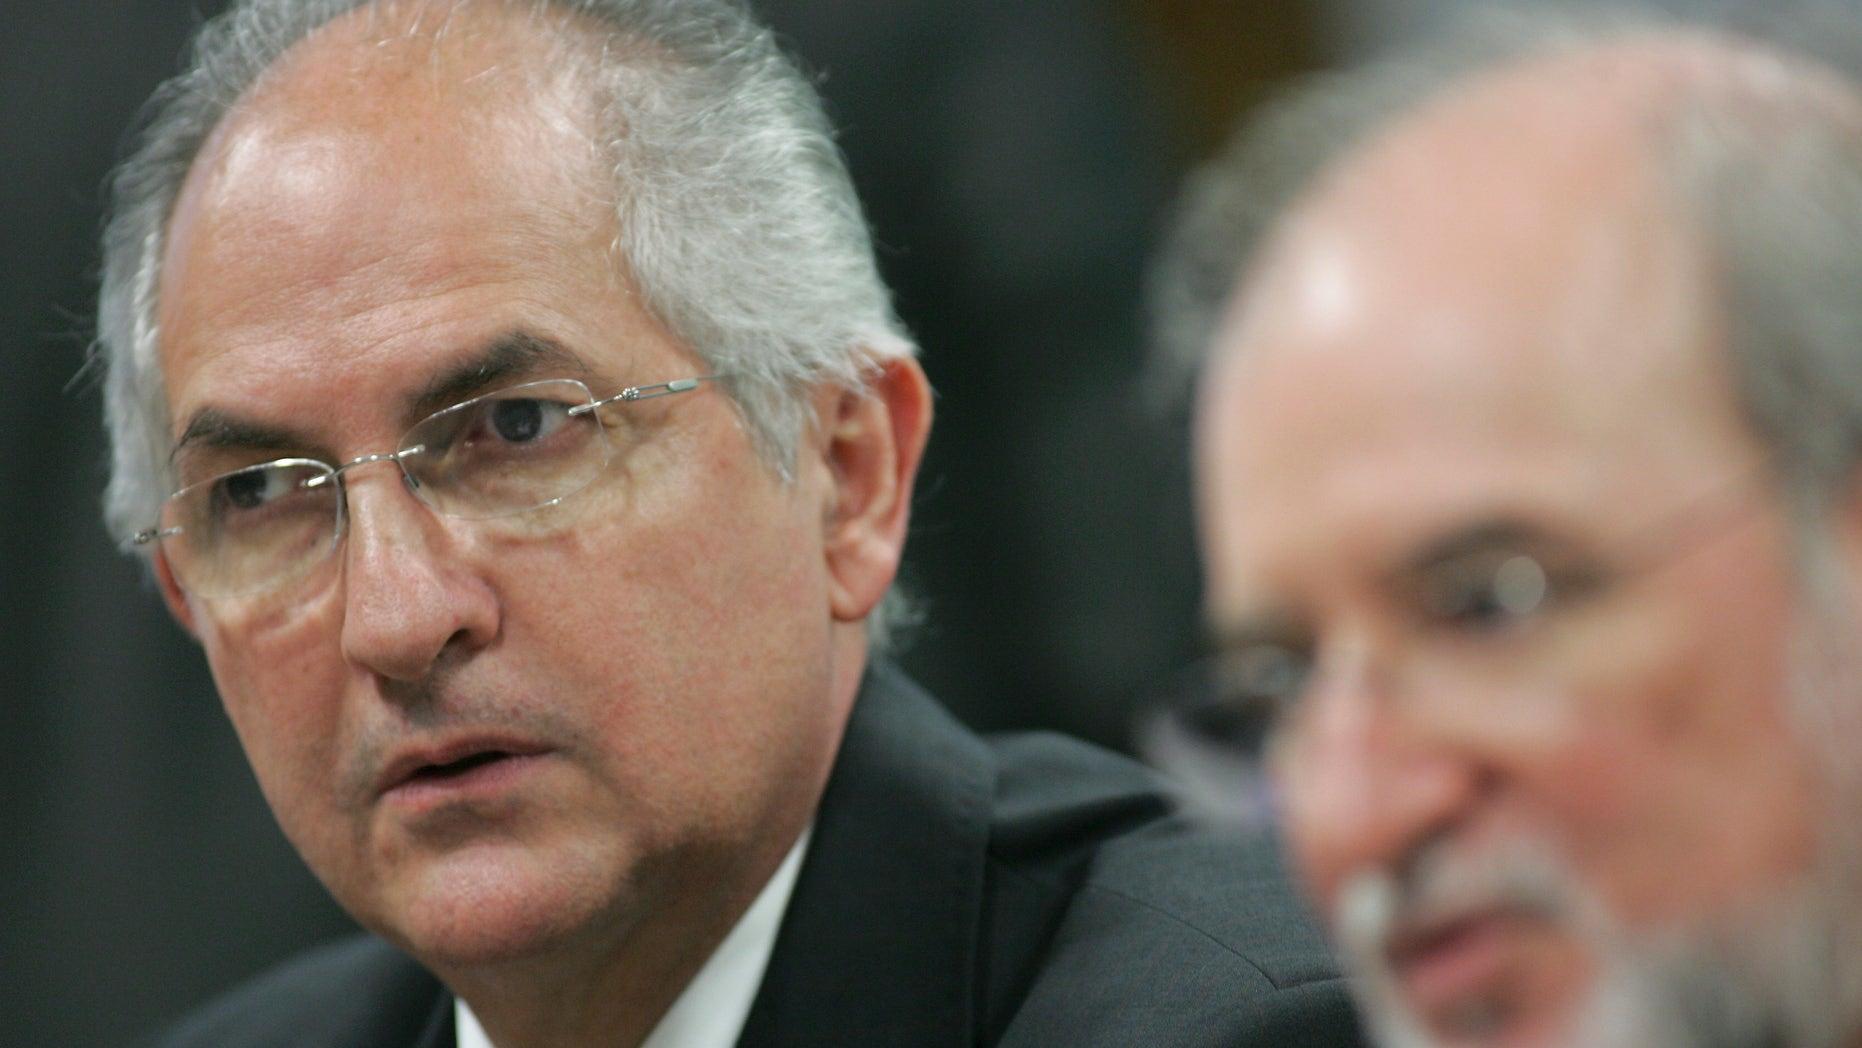 Caracas Mayor Antonio Ledezma, left, attends a meeting in senate chambers, in Brasilia, Brazil.(AP Photo)